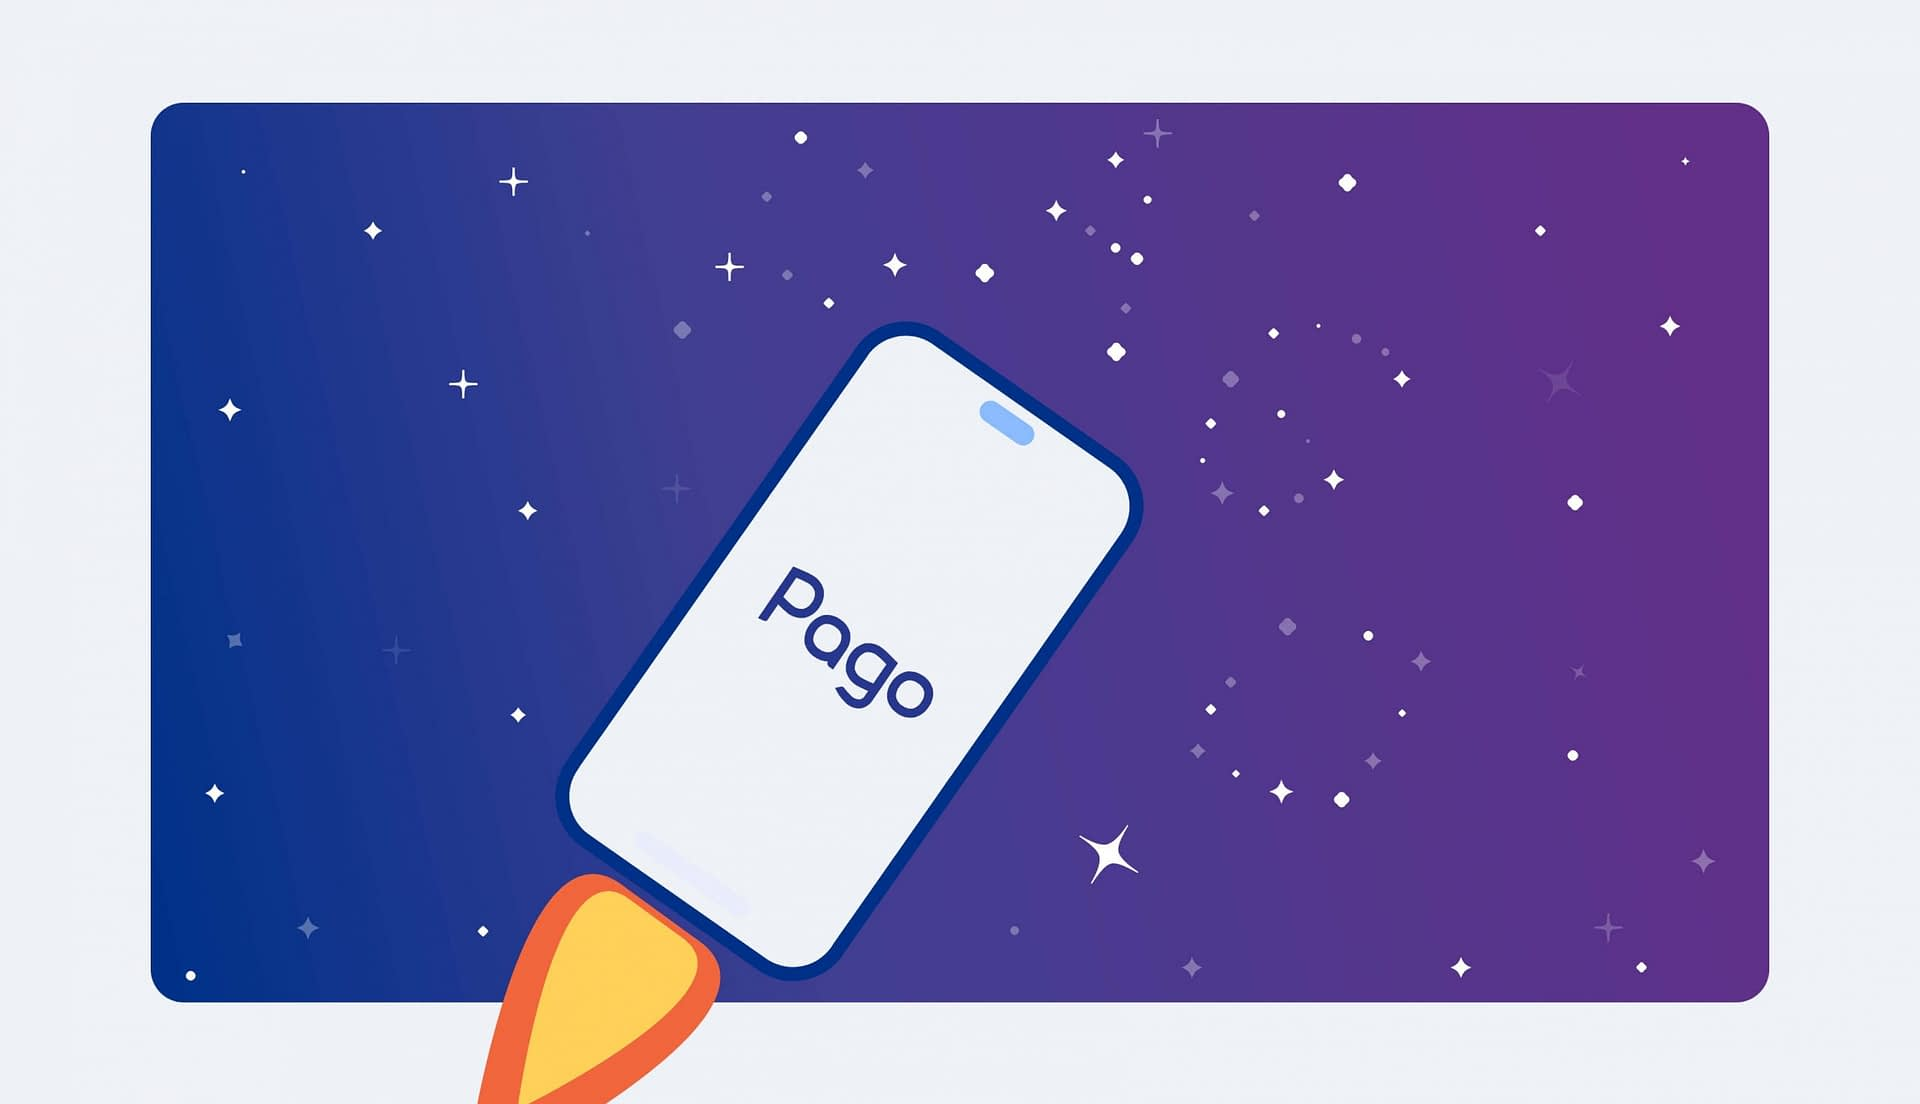 Trei ani de la prima plată la peste 100 milioane de euro procesați prin Pago